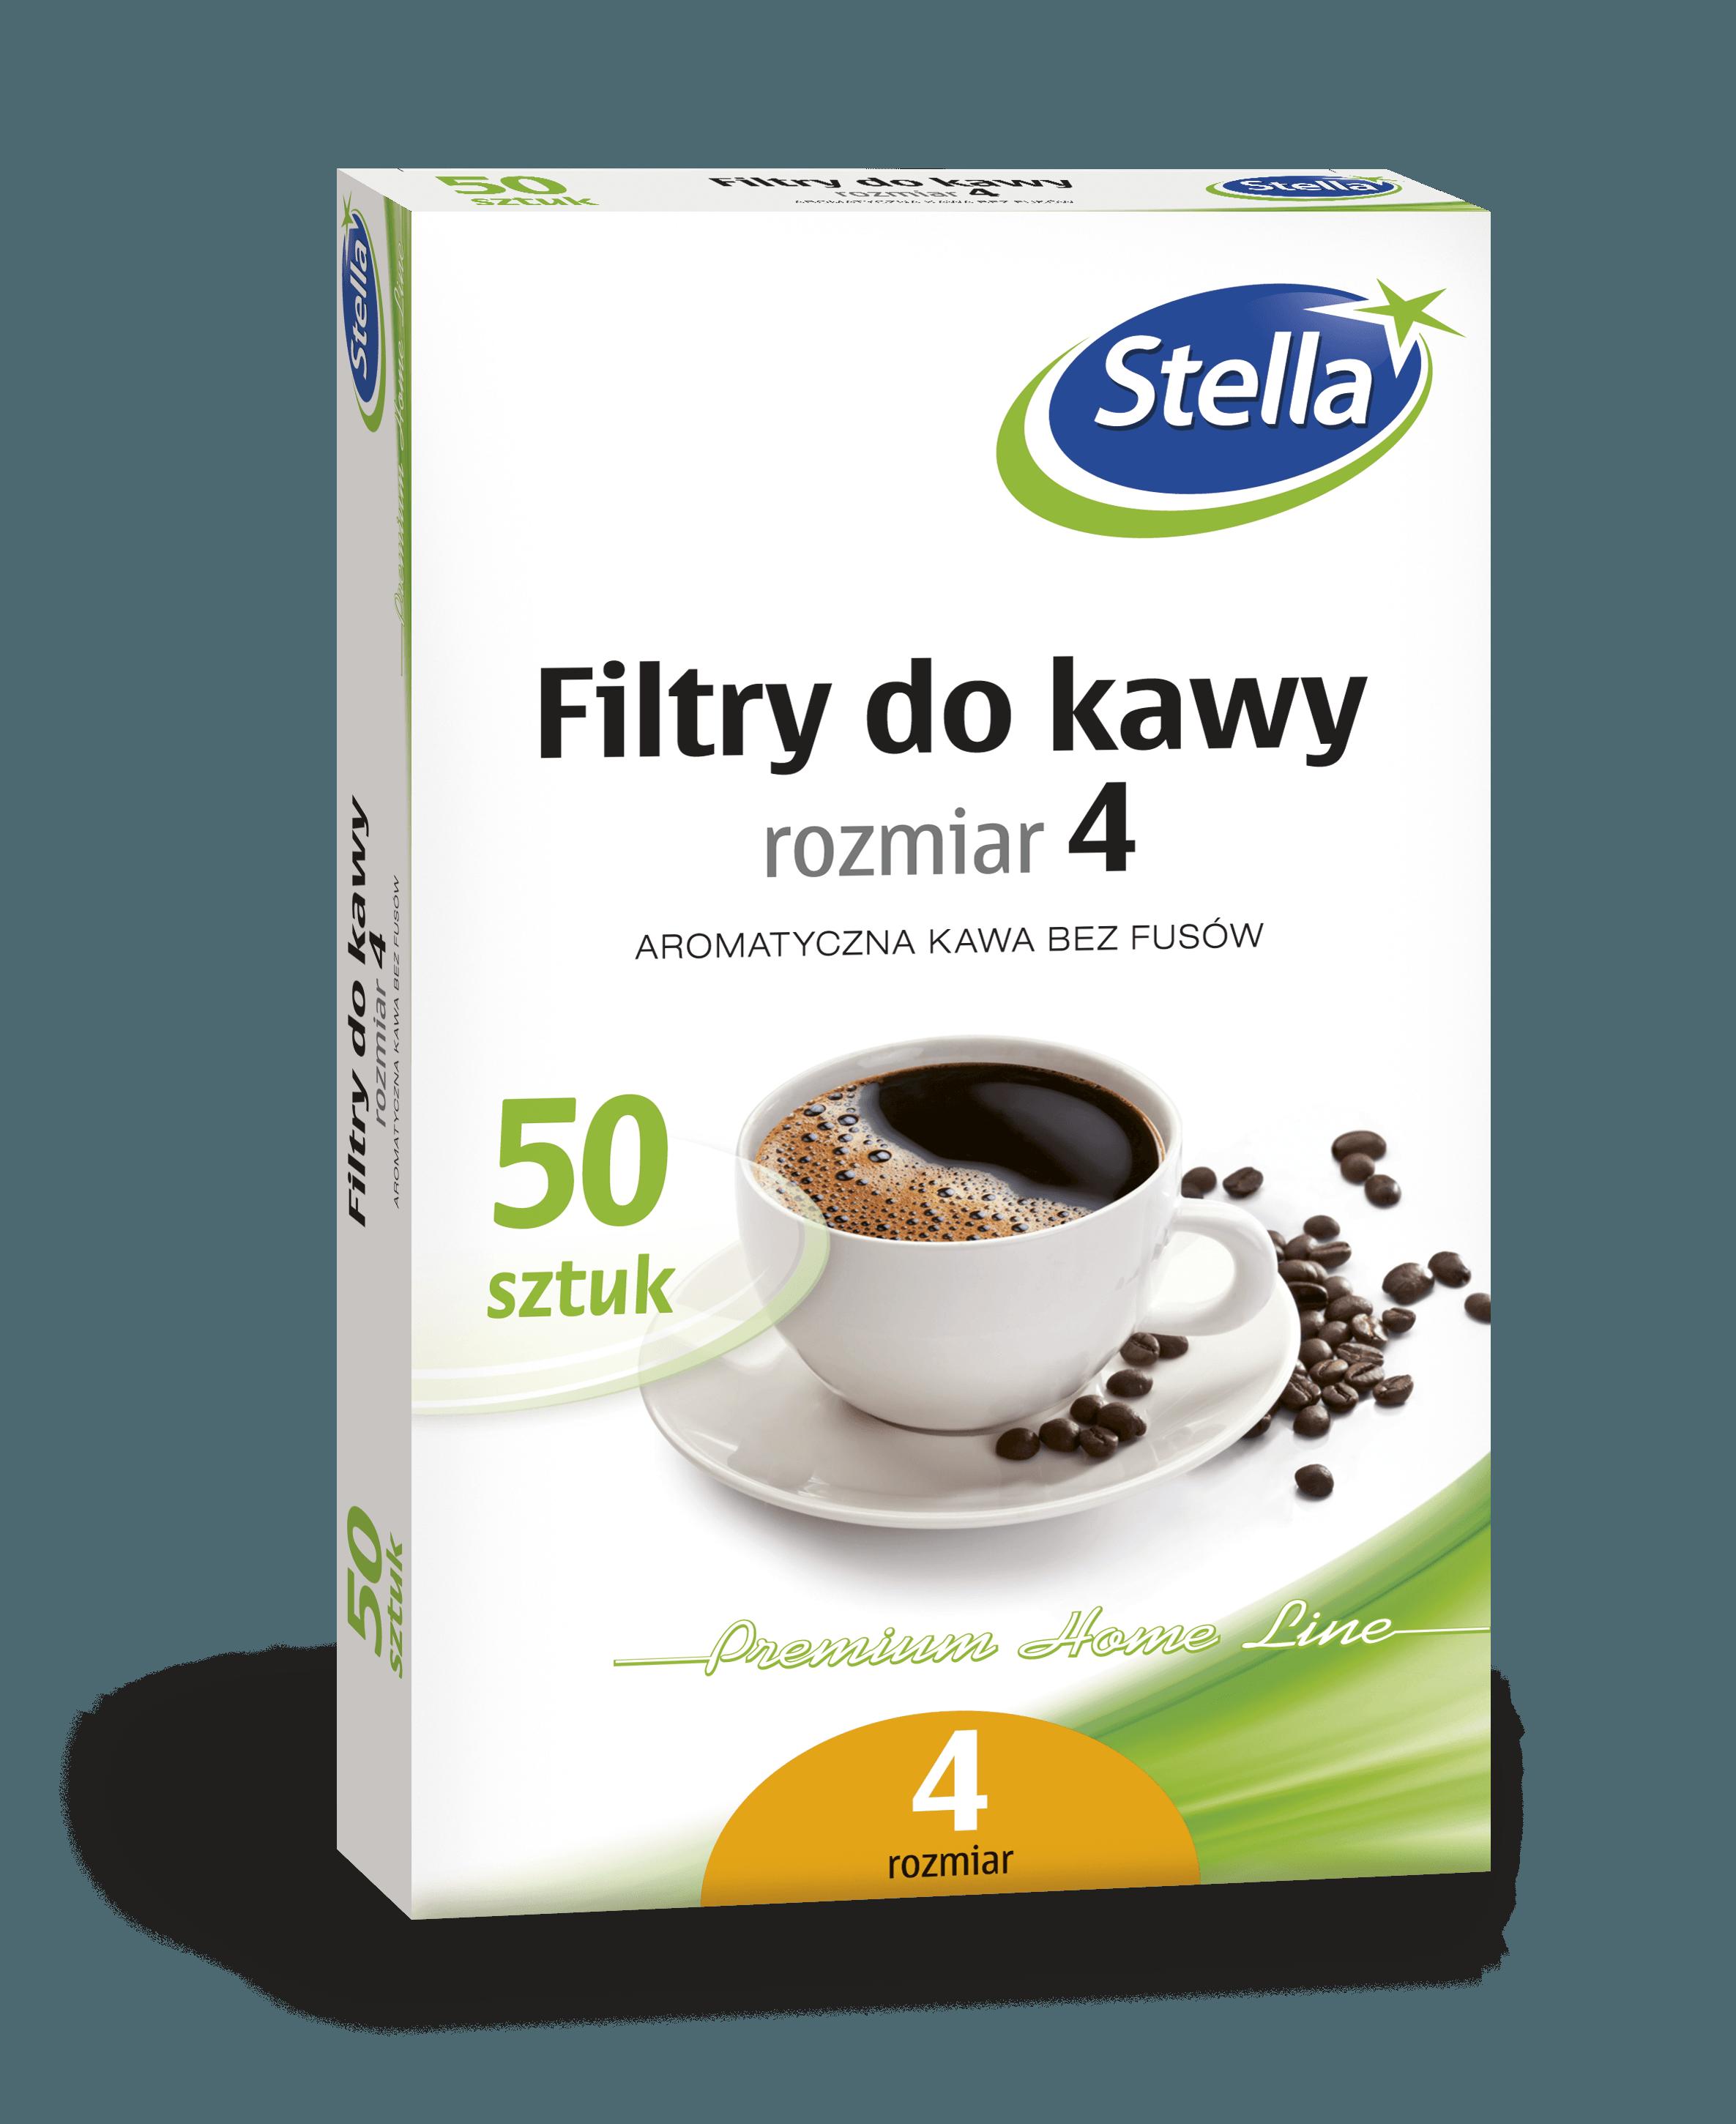 Filtry do kawy nr 4 50szt. box STELLA